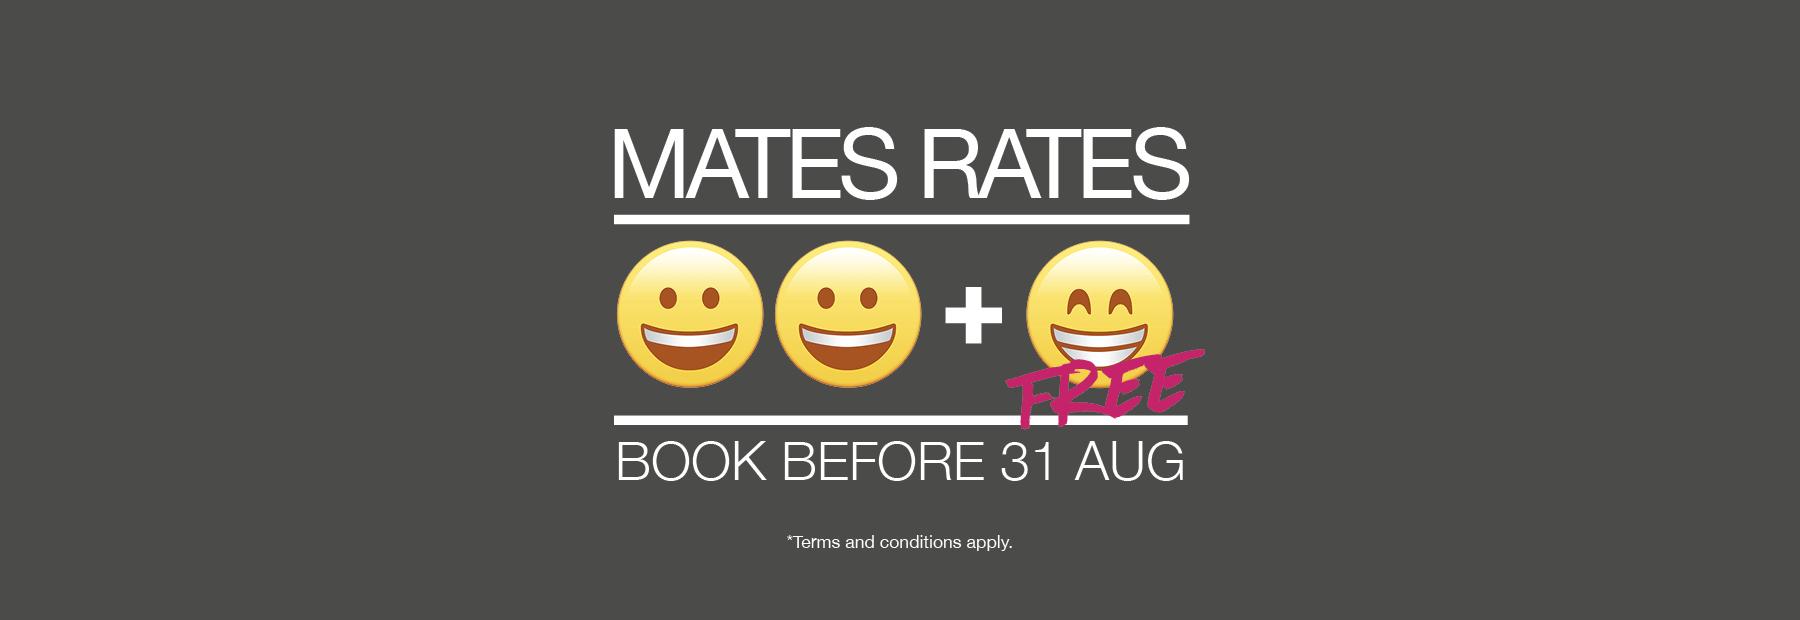 Mates Rates!